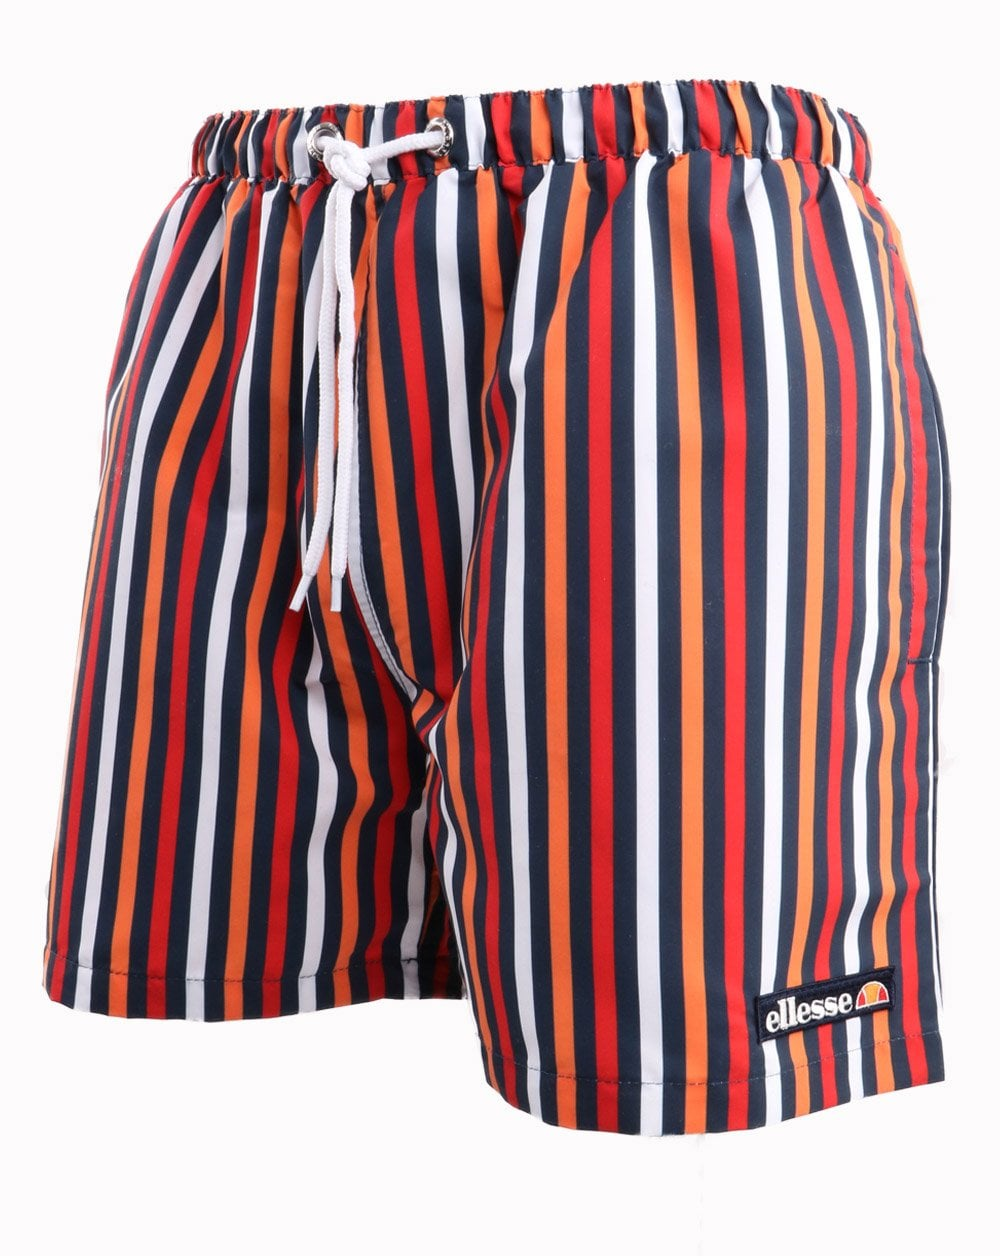 5b137dd6cc42d Ellesse Multi Stripe Swim Shorts | 80s Casual Classics